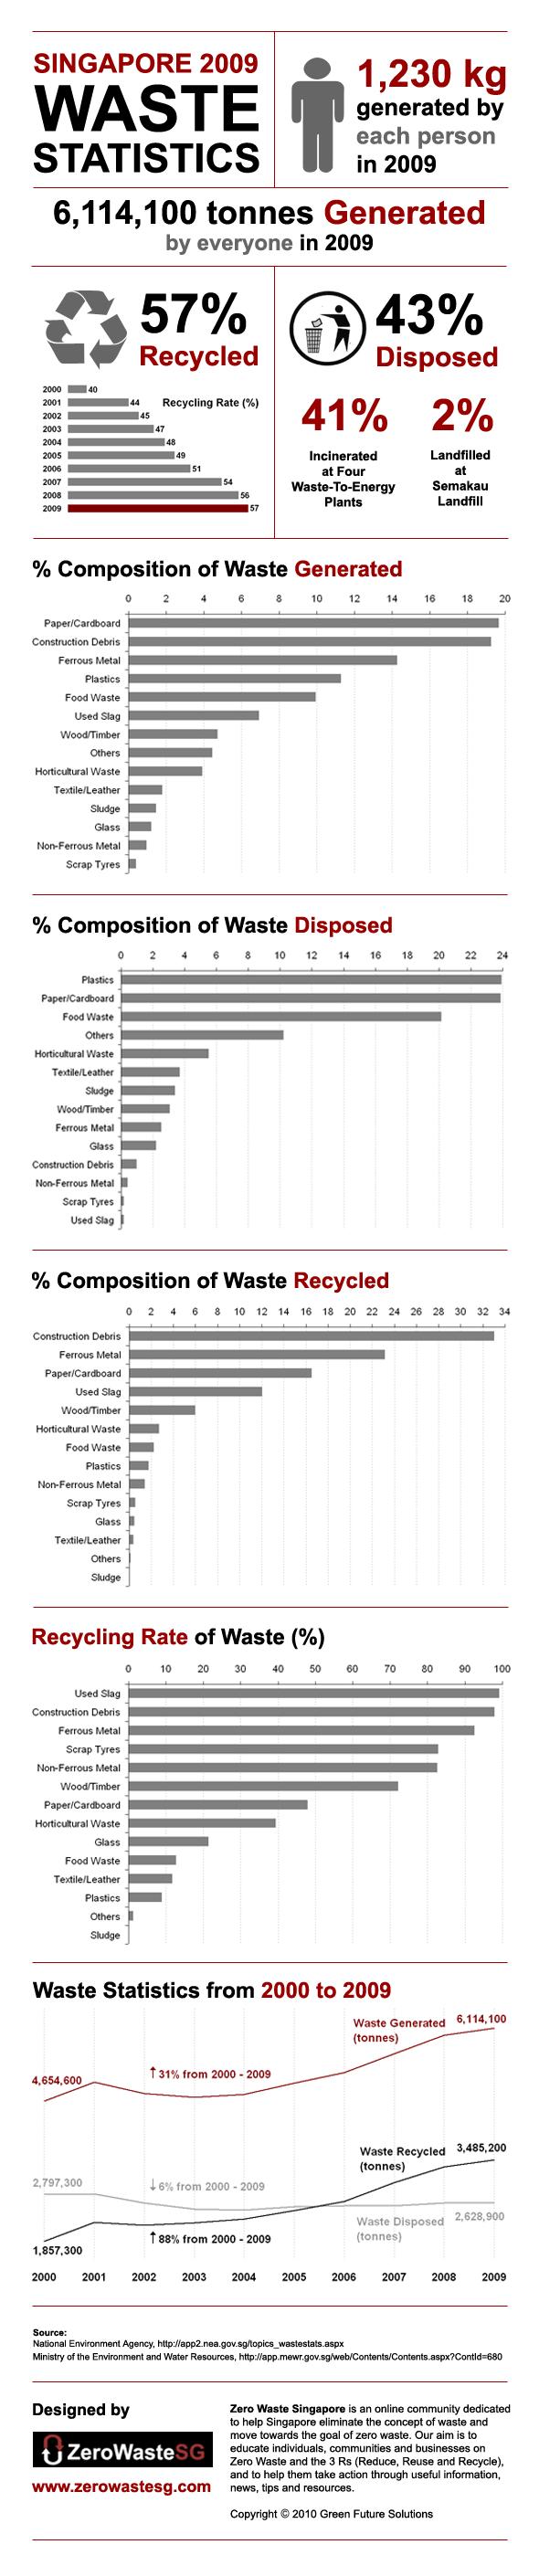 Singapore 2009 Waste Statistics